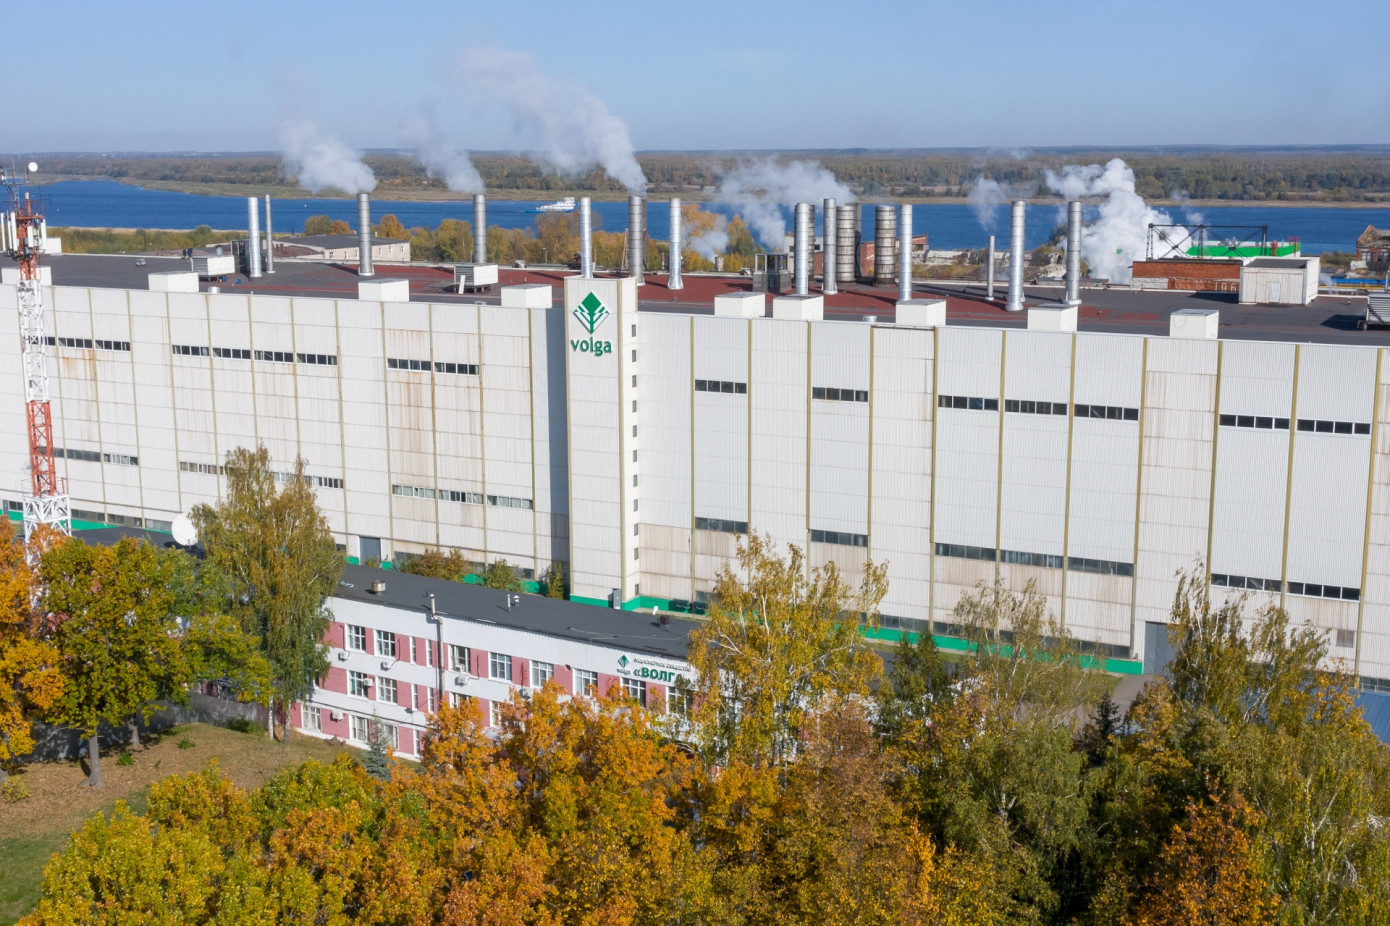 АО «Волга» инвестирует более 5 млрд руб. в модернизацию производства